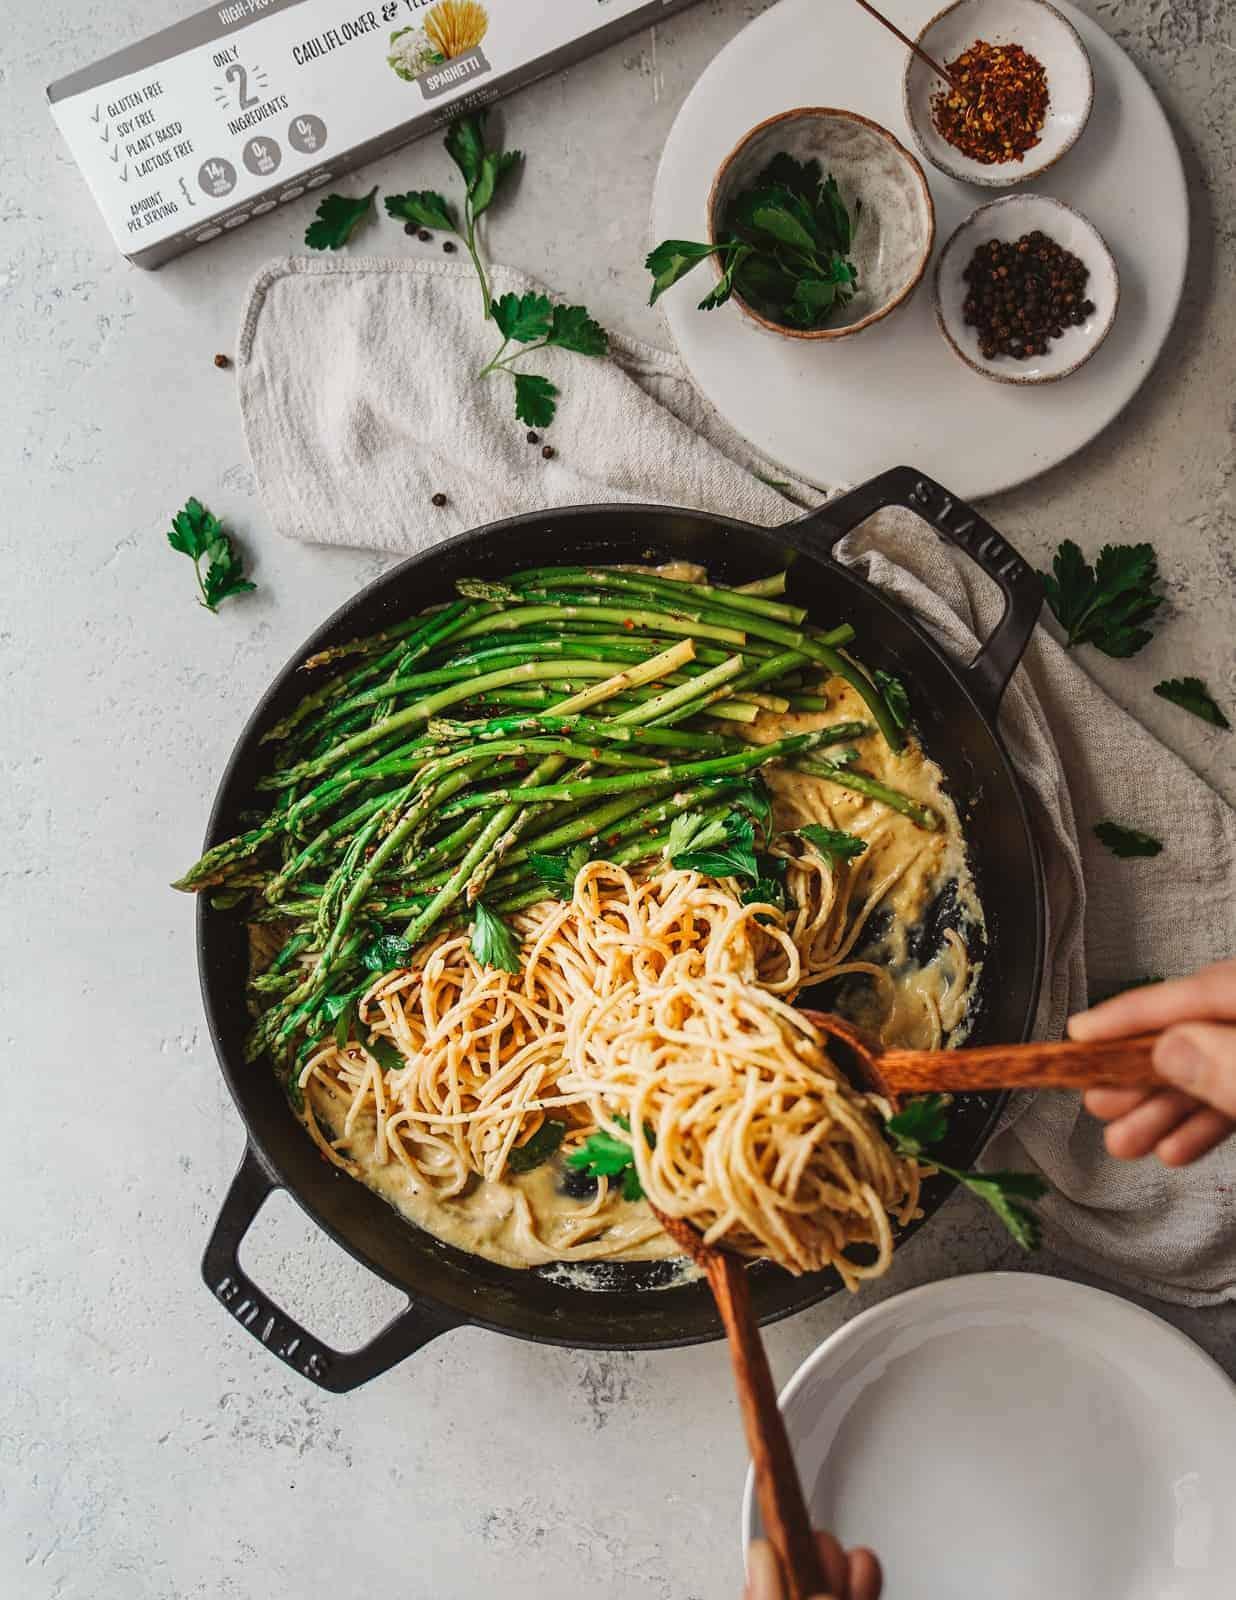 Amazing white wine pasta sauce recipe